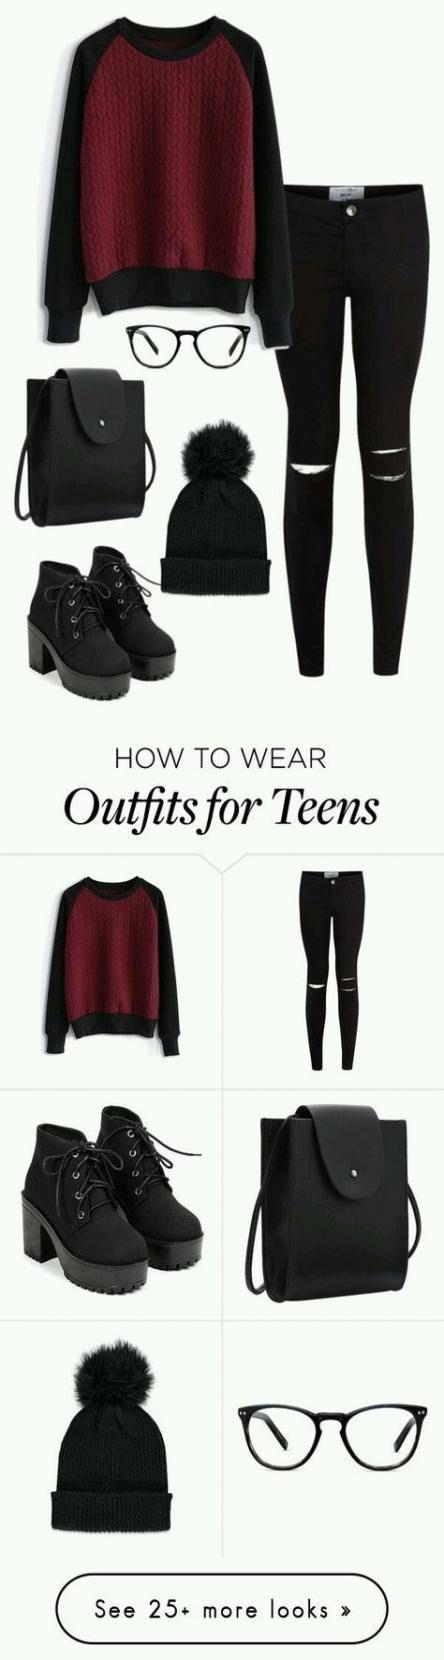 17+ Ideen Mode-Ideen für Teens Ripped Jeans für 2019